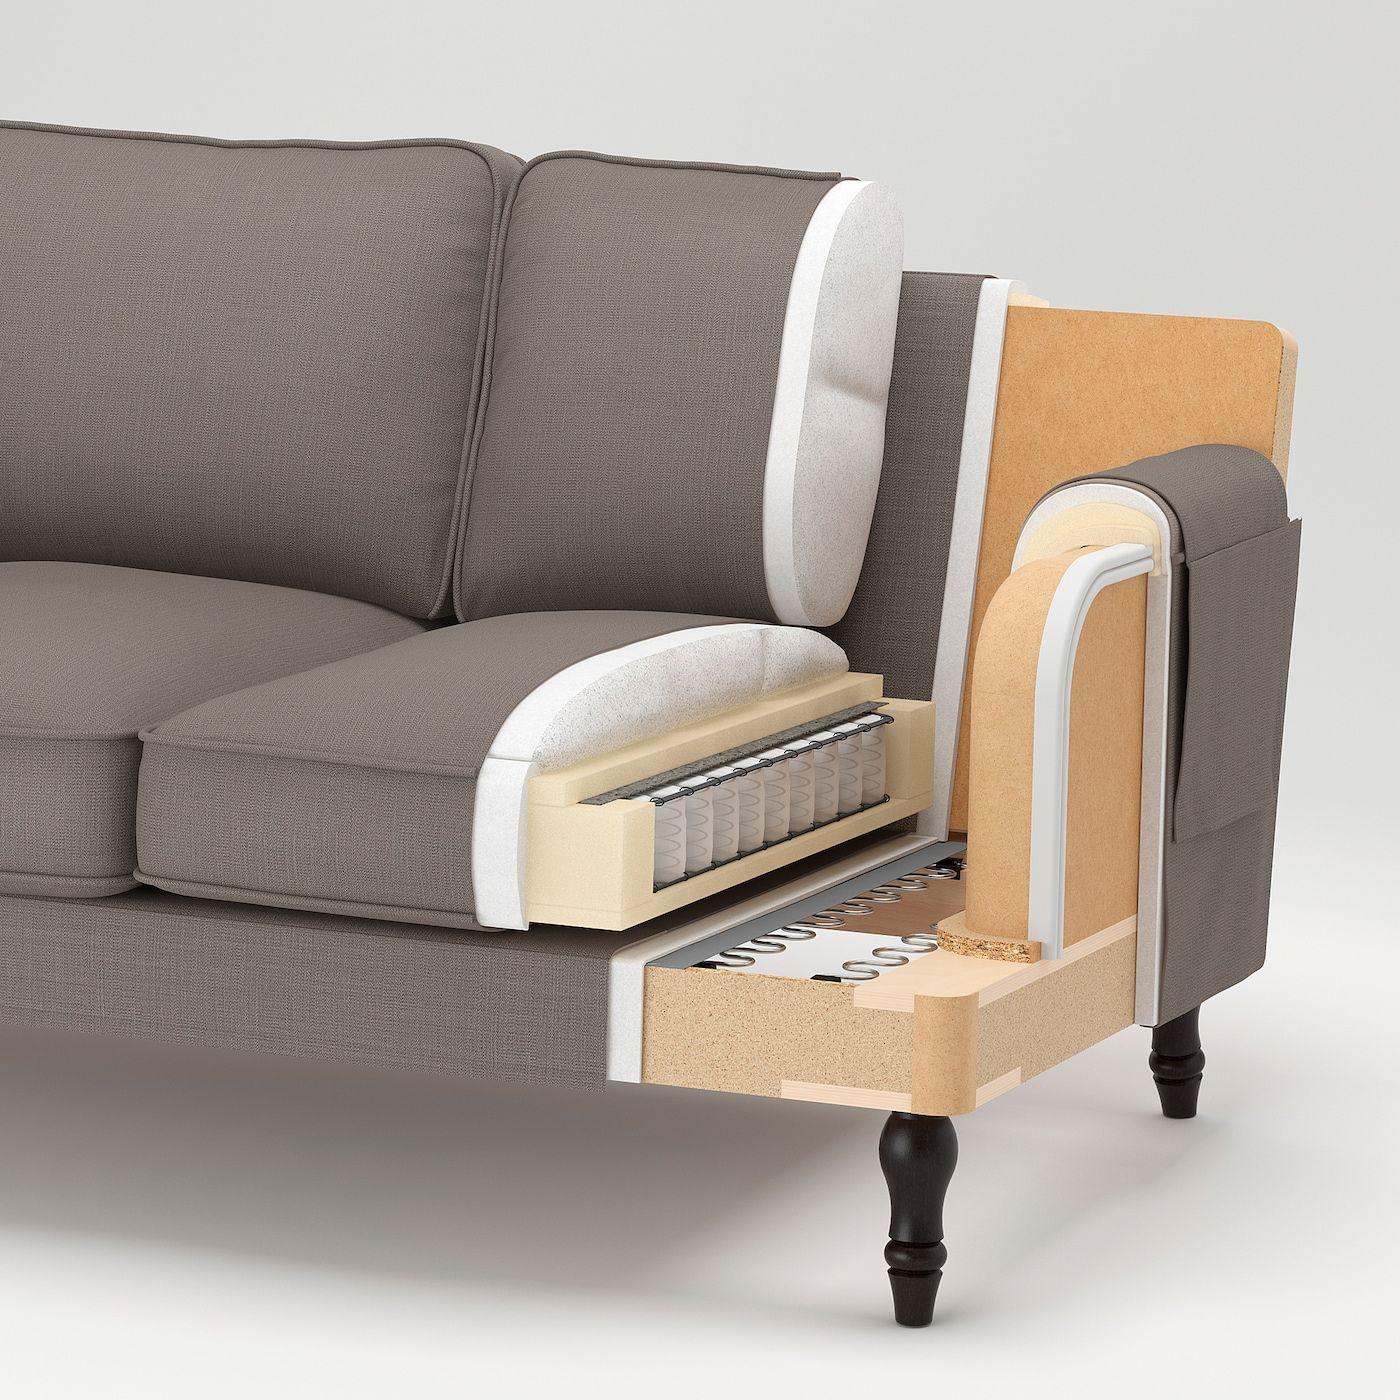 Ikea Us Furniture And Home Furnishings Furniture 2 Seater Sofa Ikea